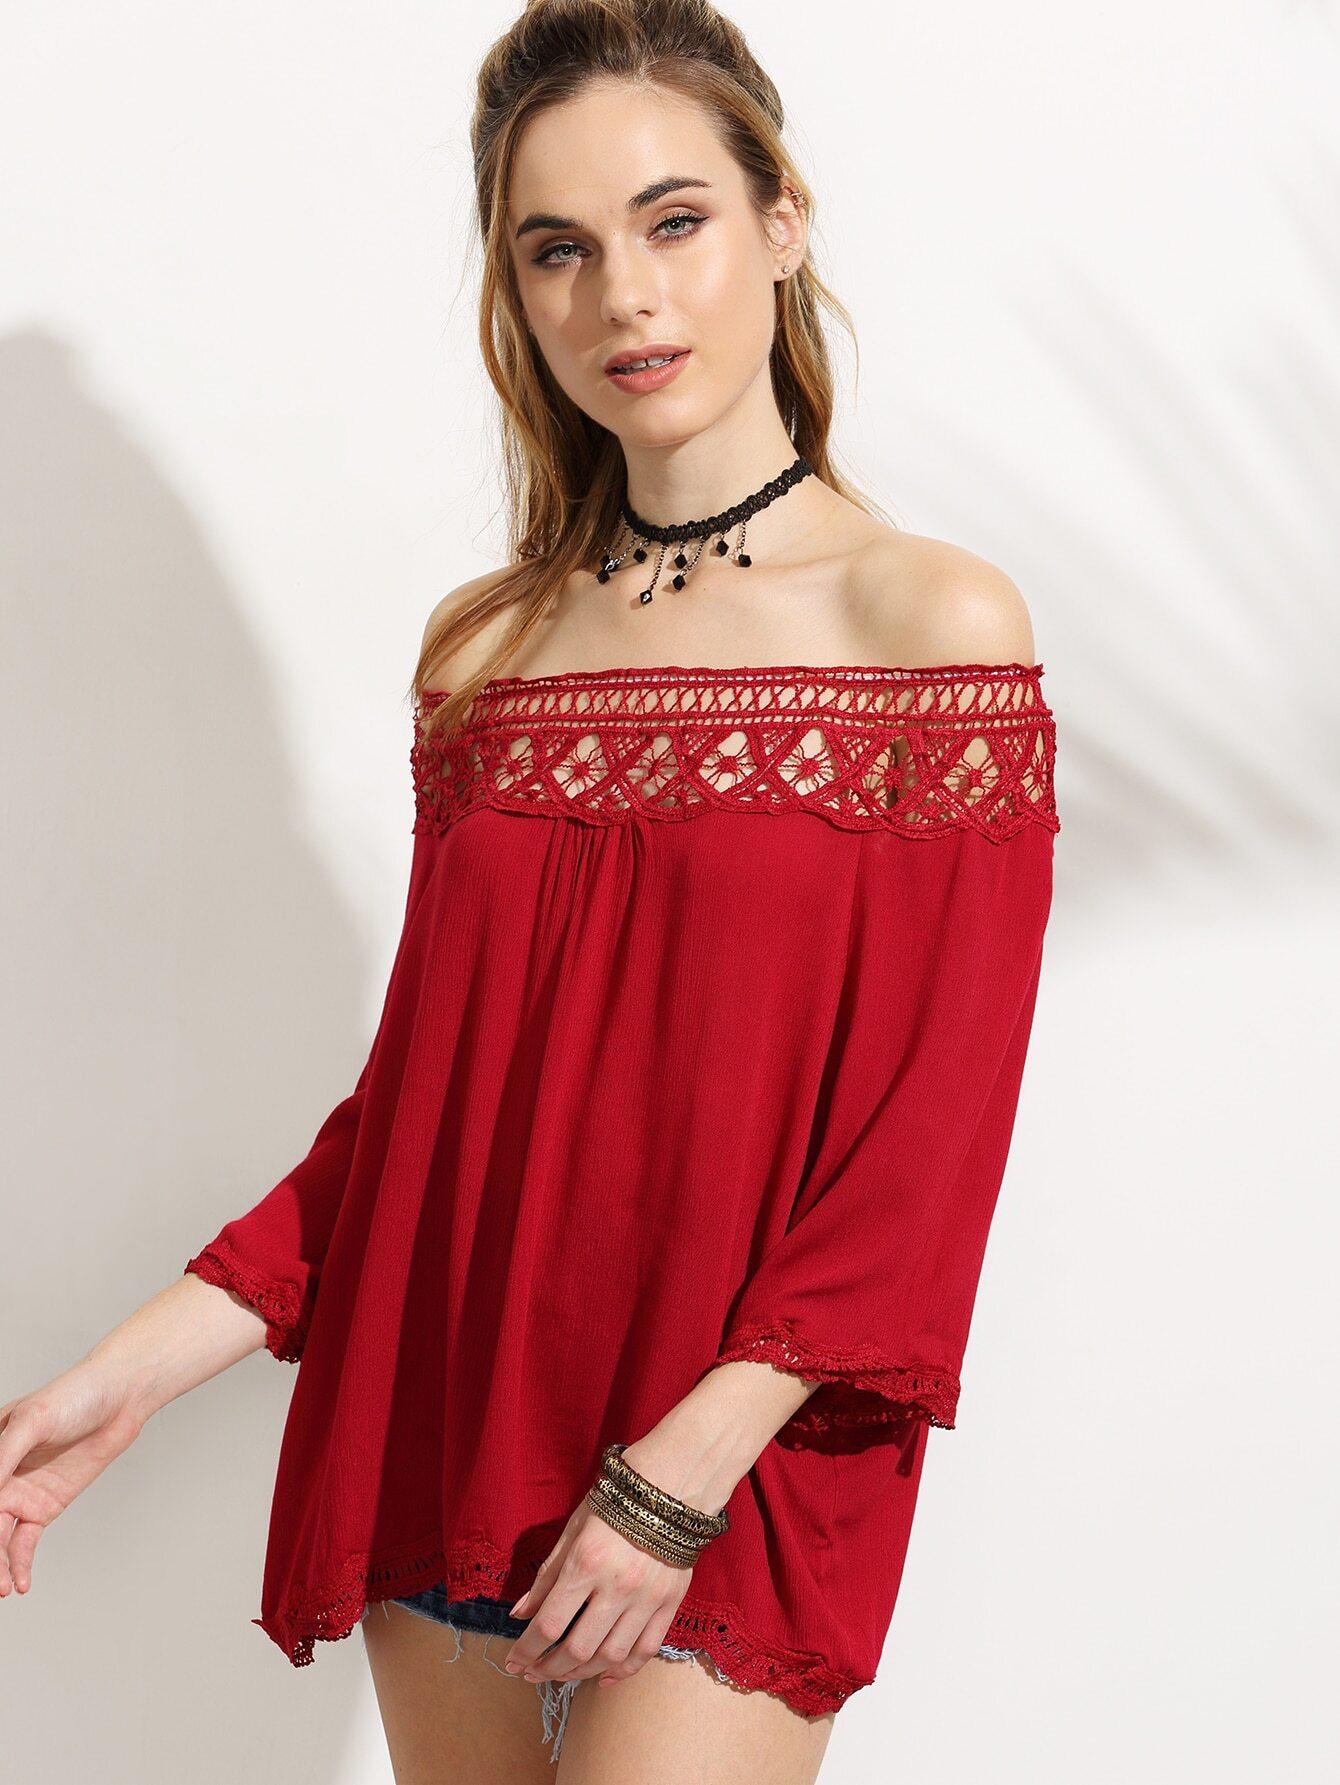 Red Crochet Insert Off The Shoulder Top Emmacloth Women